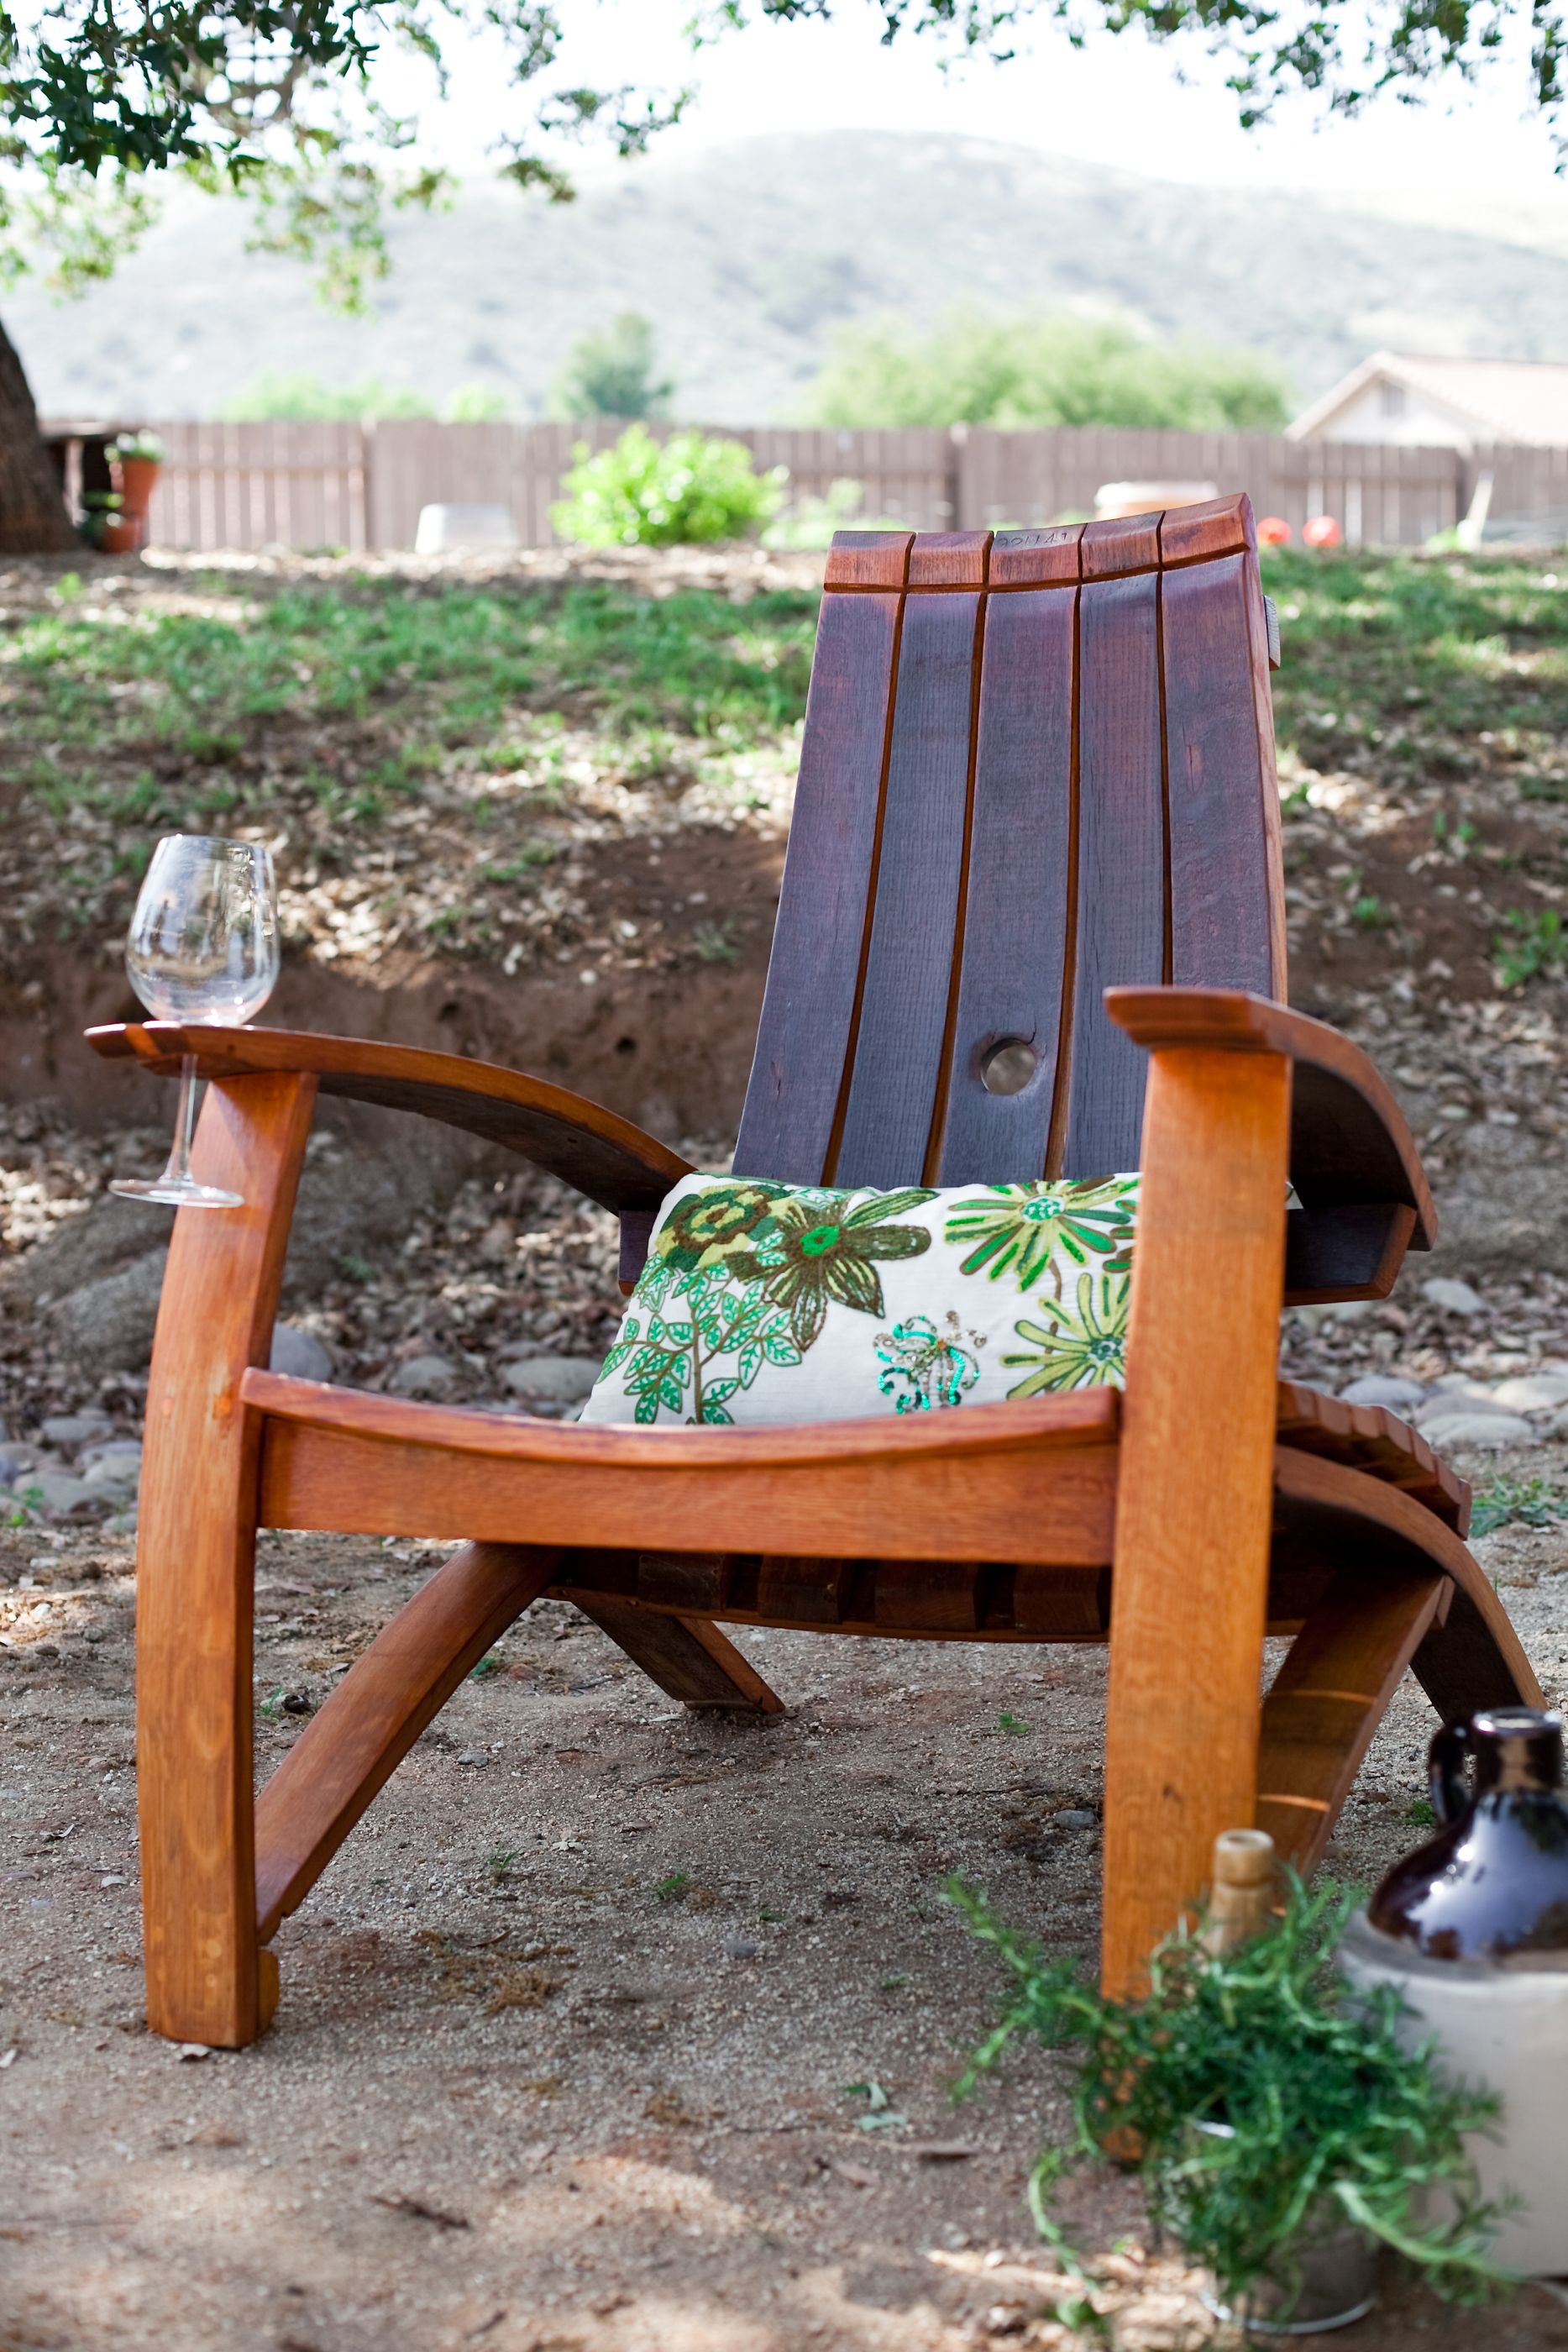 wine adirondack chair rentals phoenix designed by craftsman david brown of